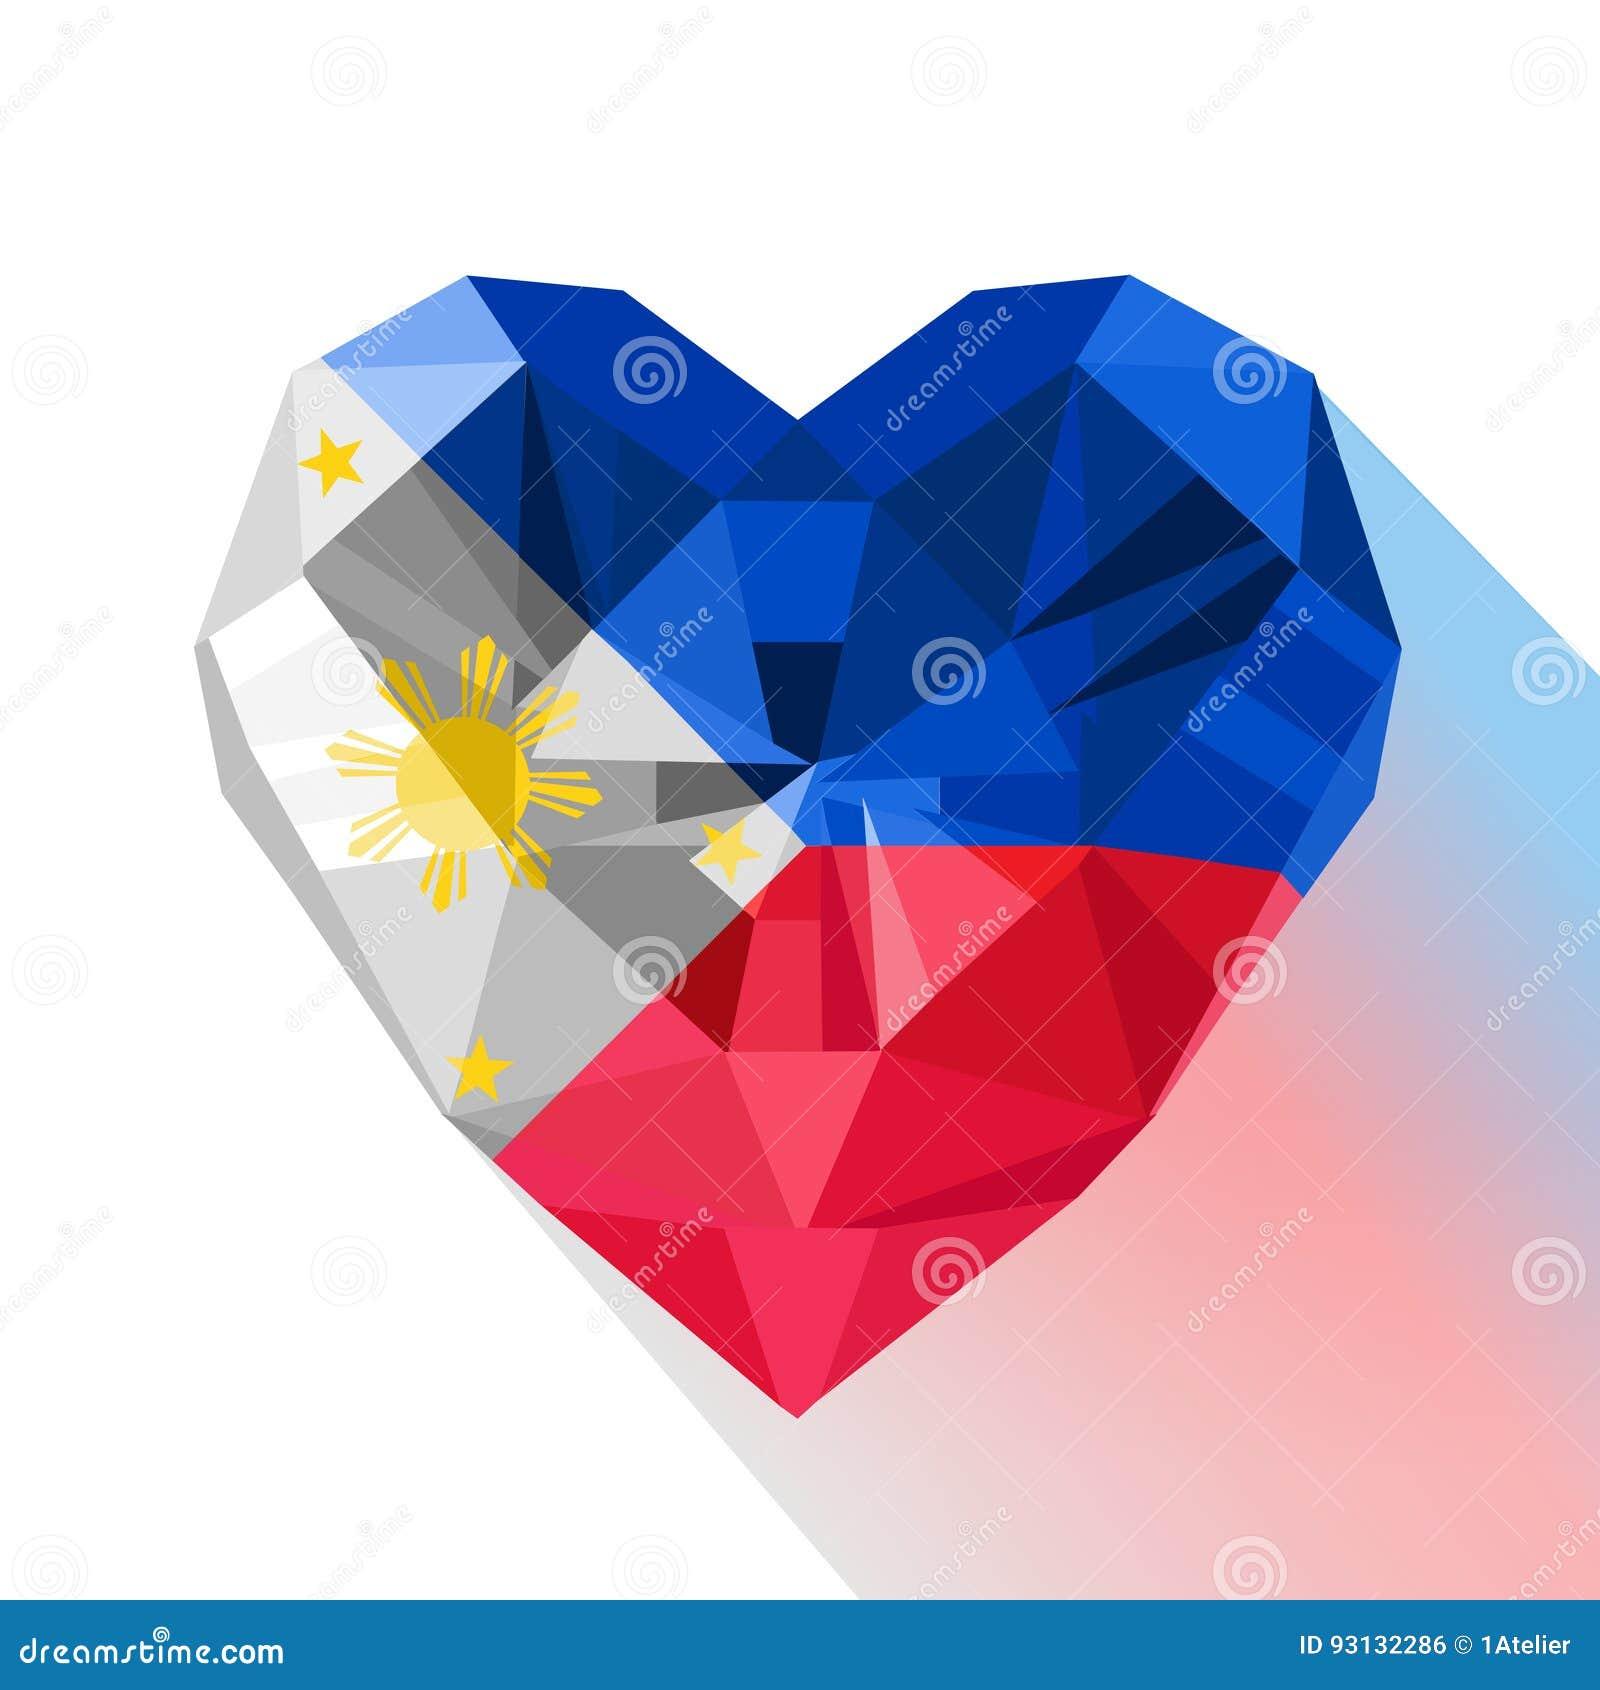 Polygonal logo symbol of love philippines stock vector polygonal logo symbol of love philippines buycottarizona Images